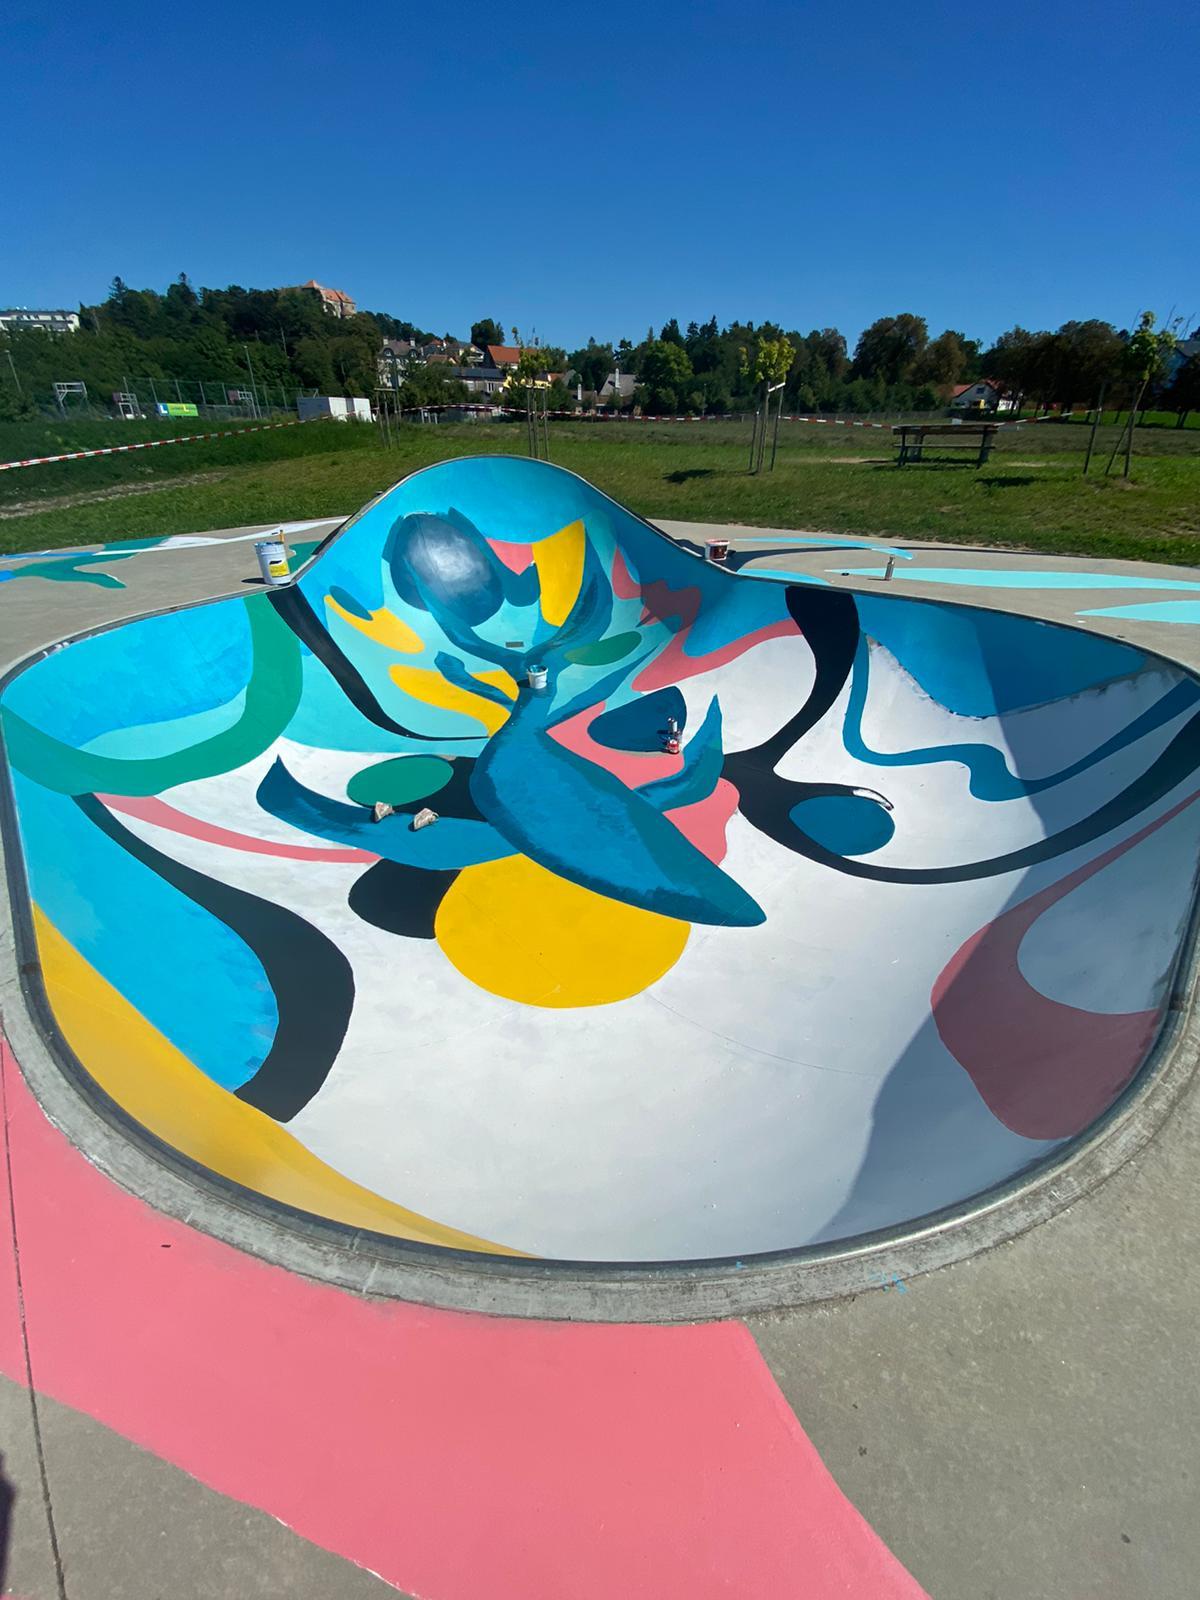 Gamze Yalcin Skatepark Neulengbach 2020 #Benonconform